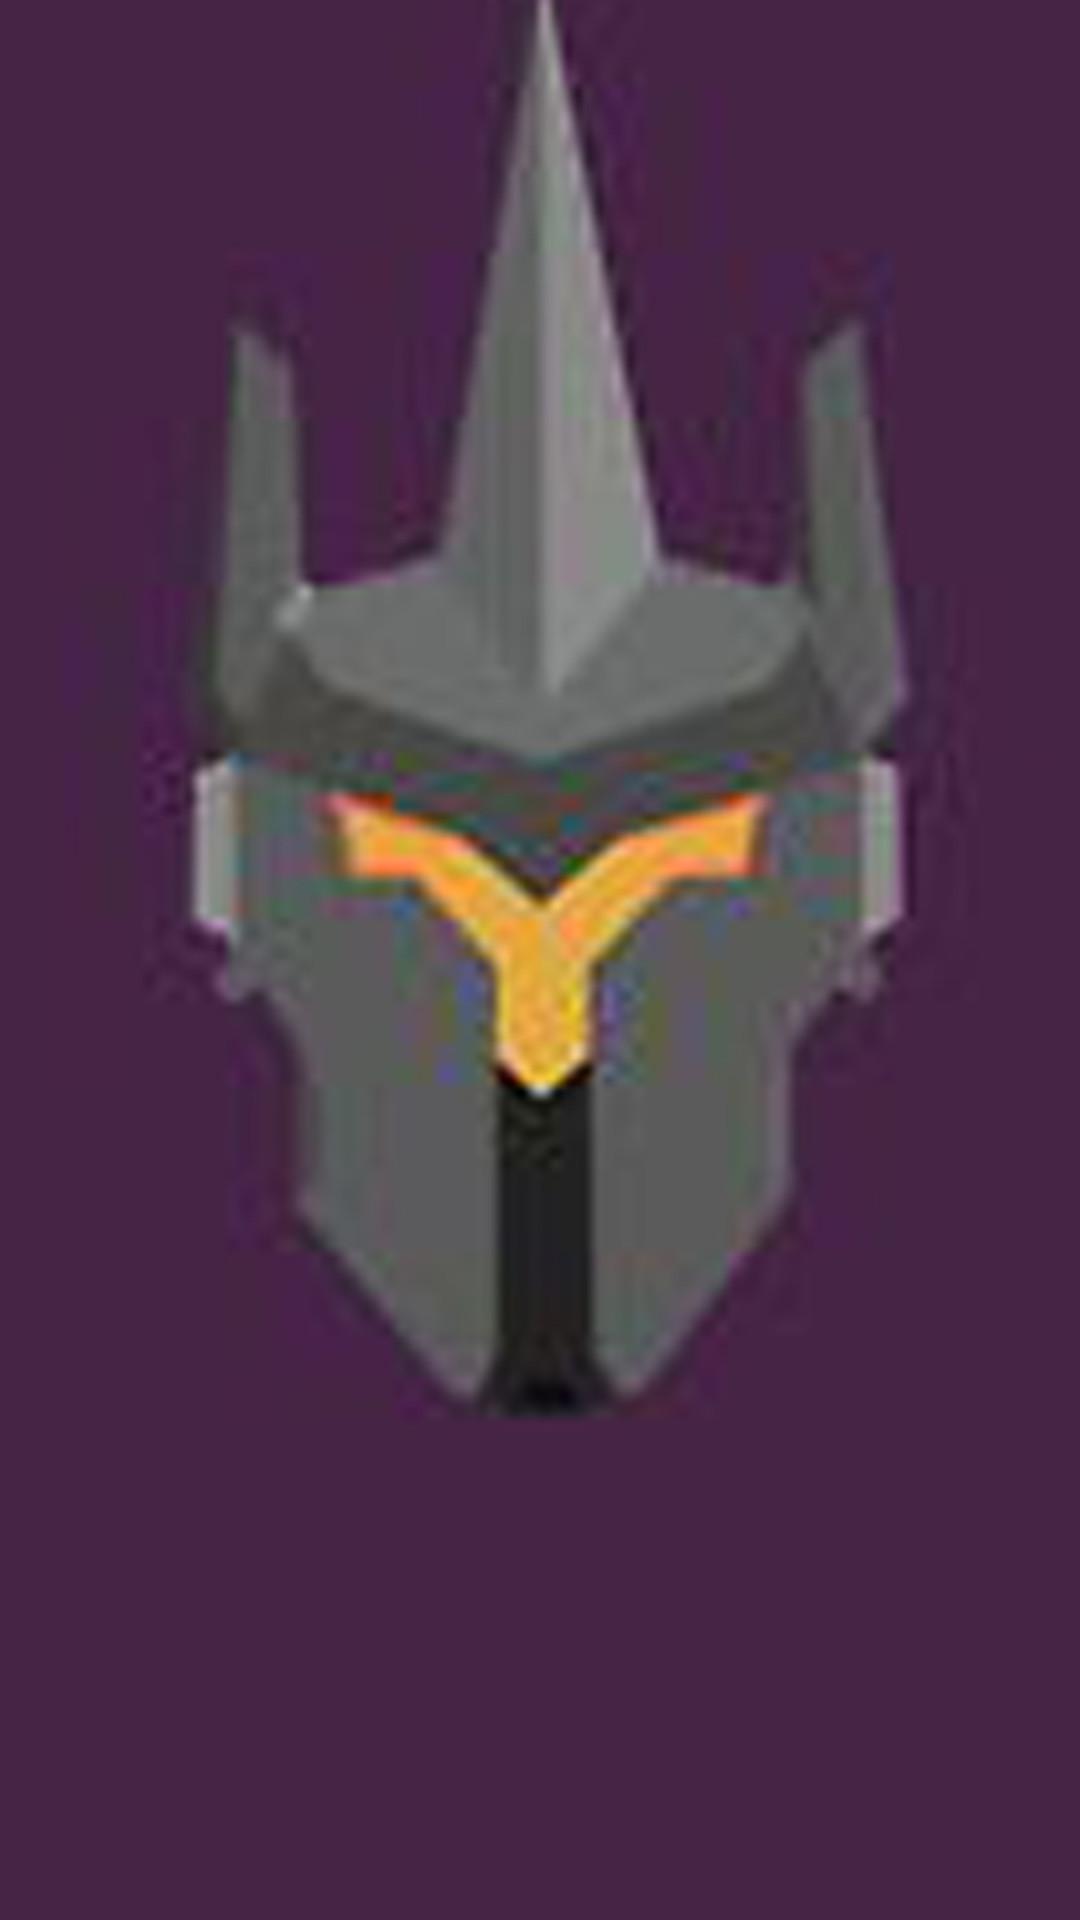 Reinhardt Dragon Slayer Overwatch wallpapers For iphone se